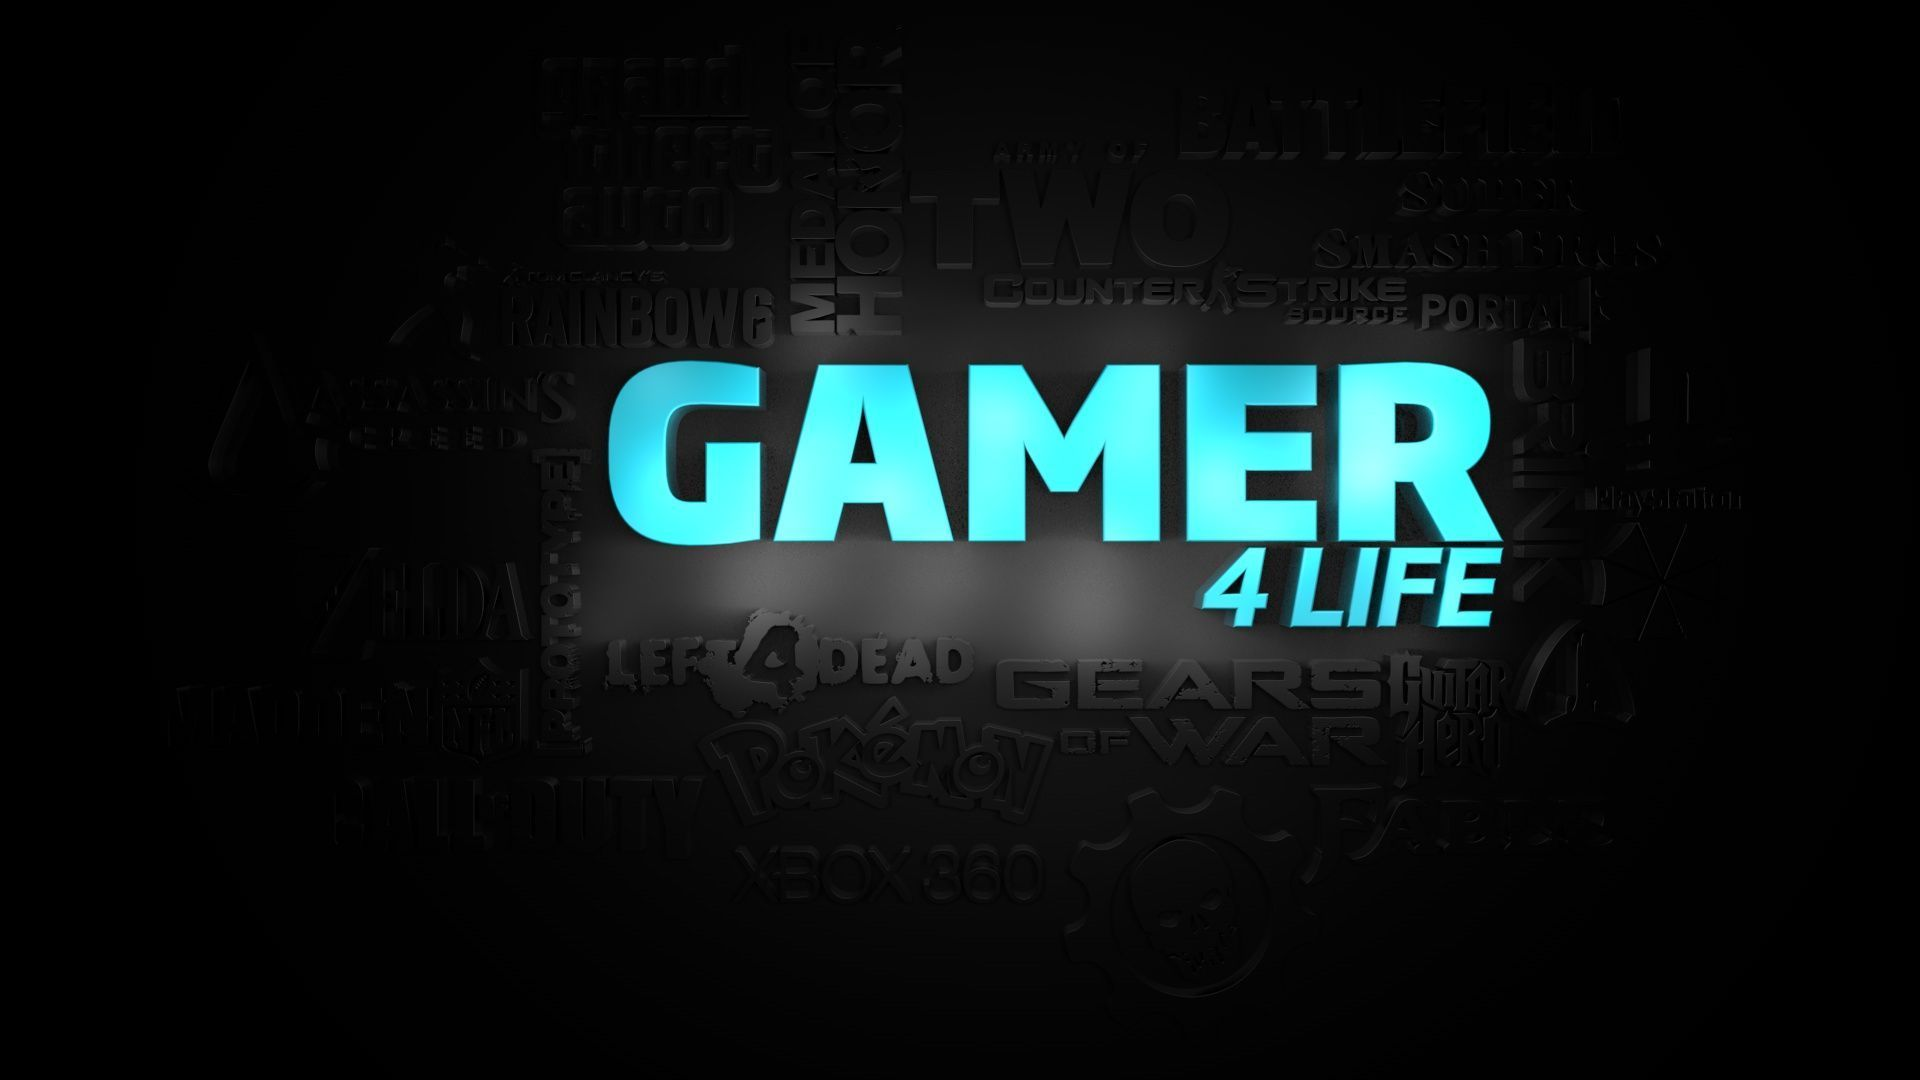 Gamer Wallpaper Collection For Free Download Hình ảnh